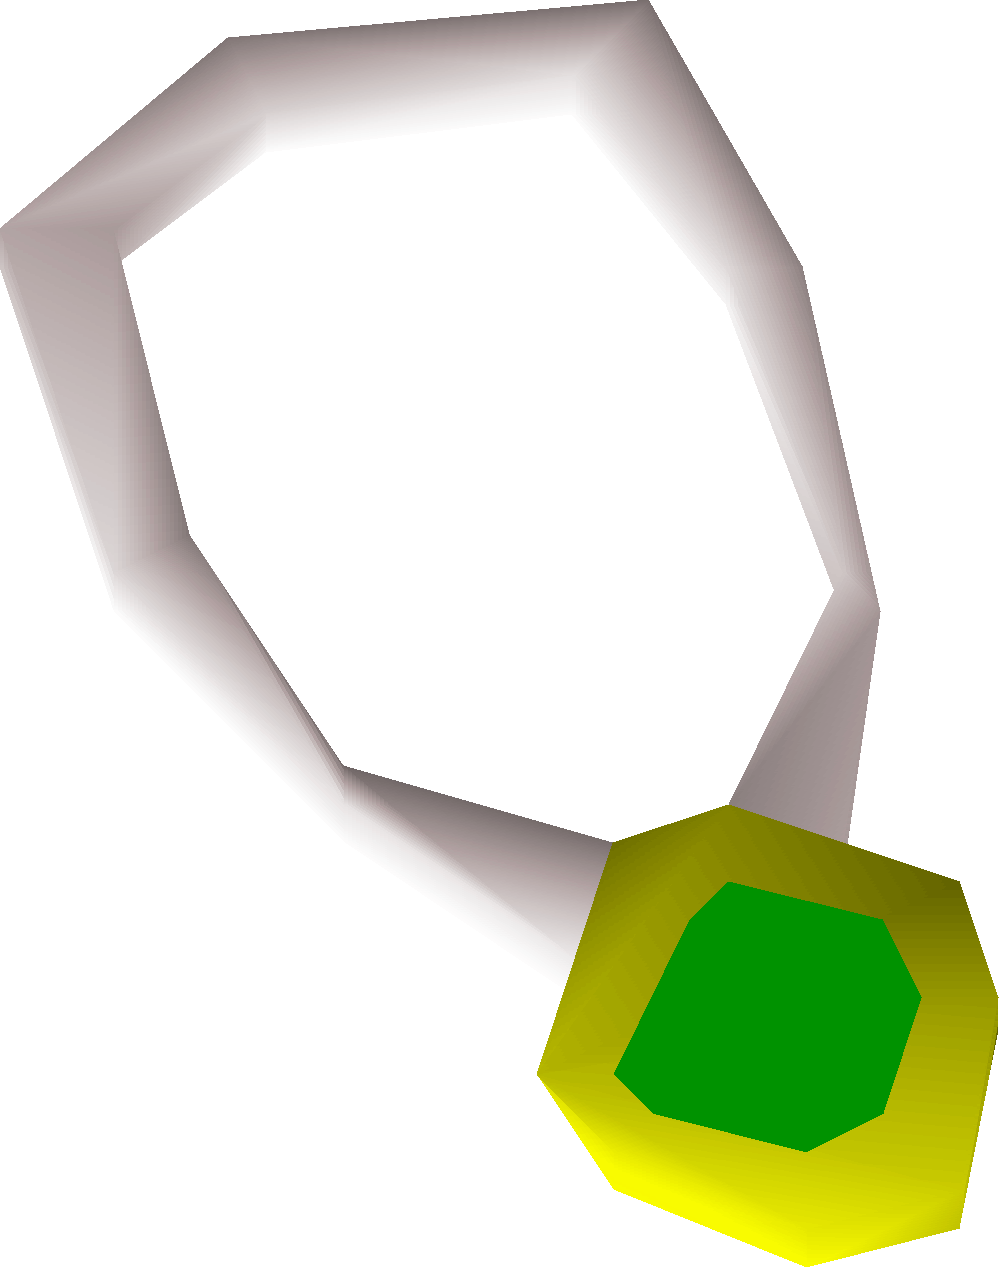 Emerald amulet